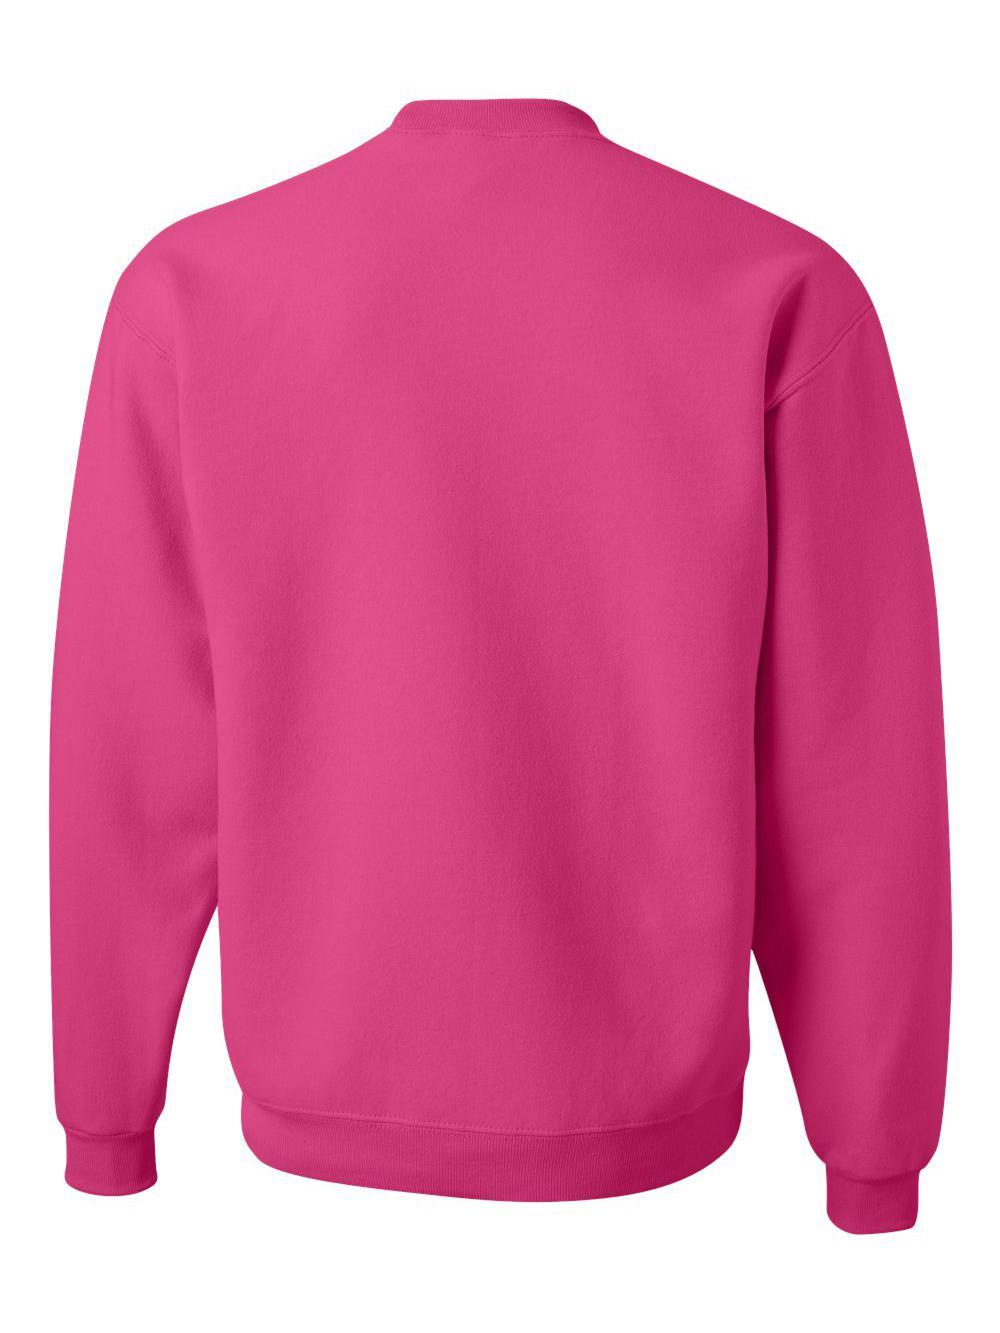 Jerzees-NuBlend-Crewneck-Sweatshirt-562MR thumbnail 34